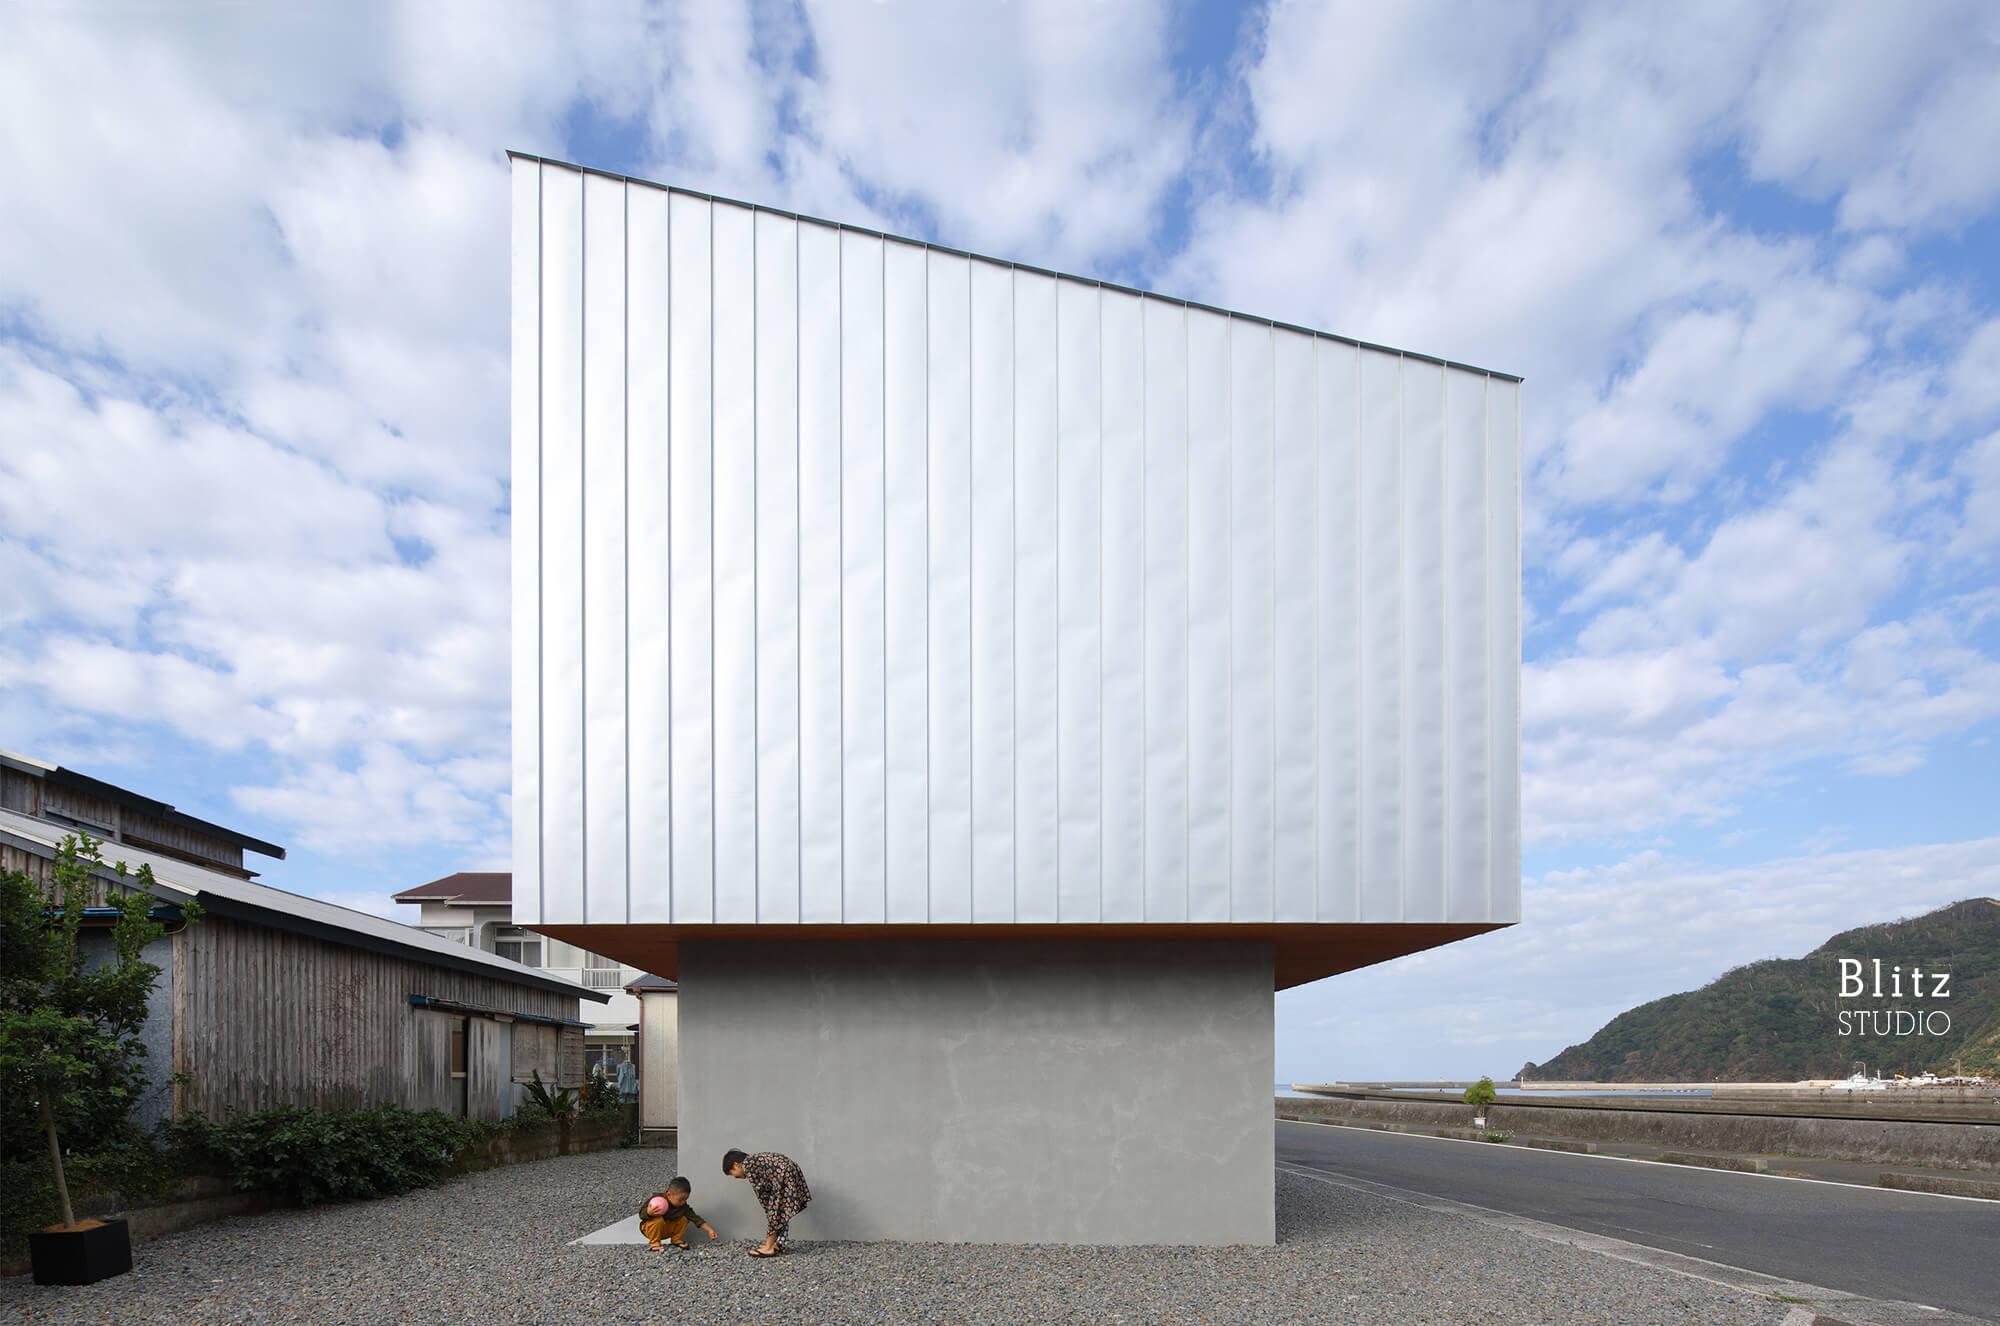 『名瀬鳩浜の家』-鹿児島県奄美大島-建築写真・竣工写真・インテリア写真1